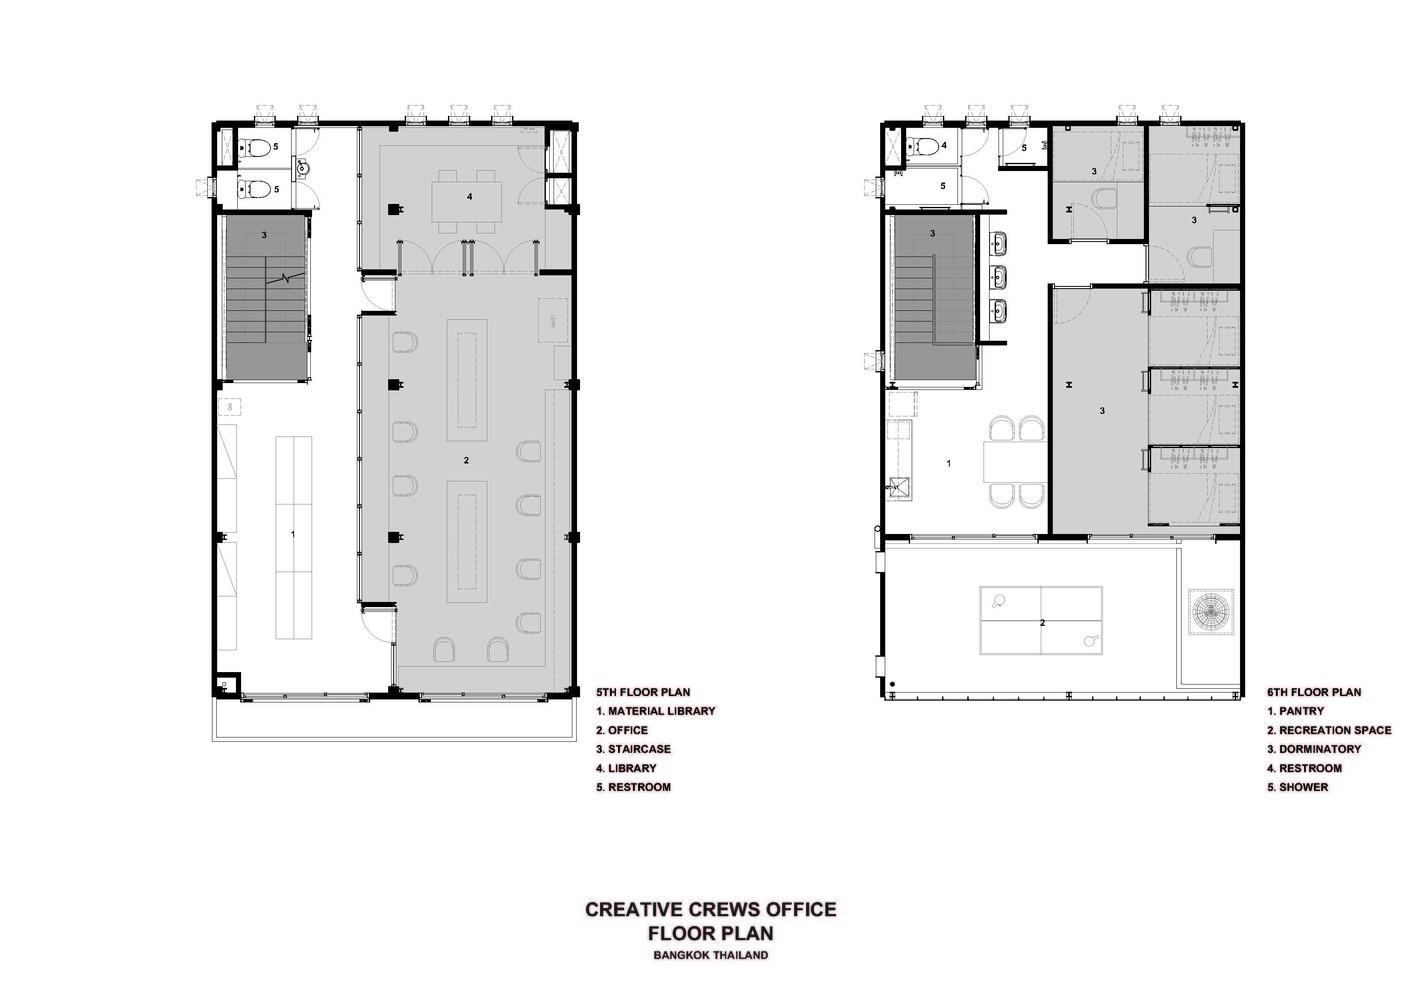 New Office Floor Plan 6 Pattern House Plans Gallery Ideas